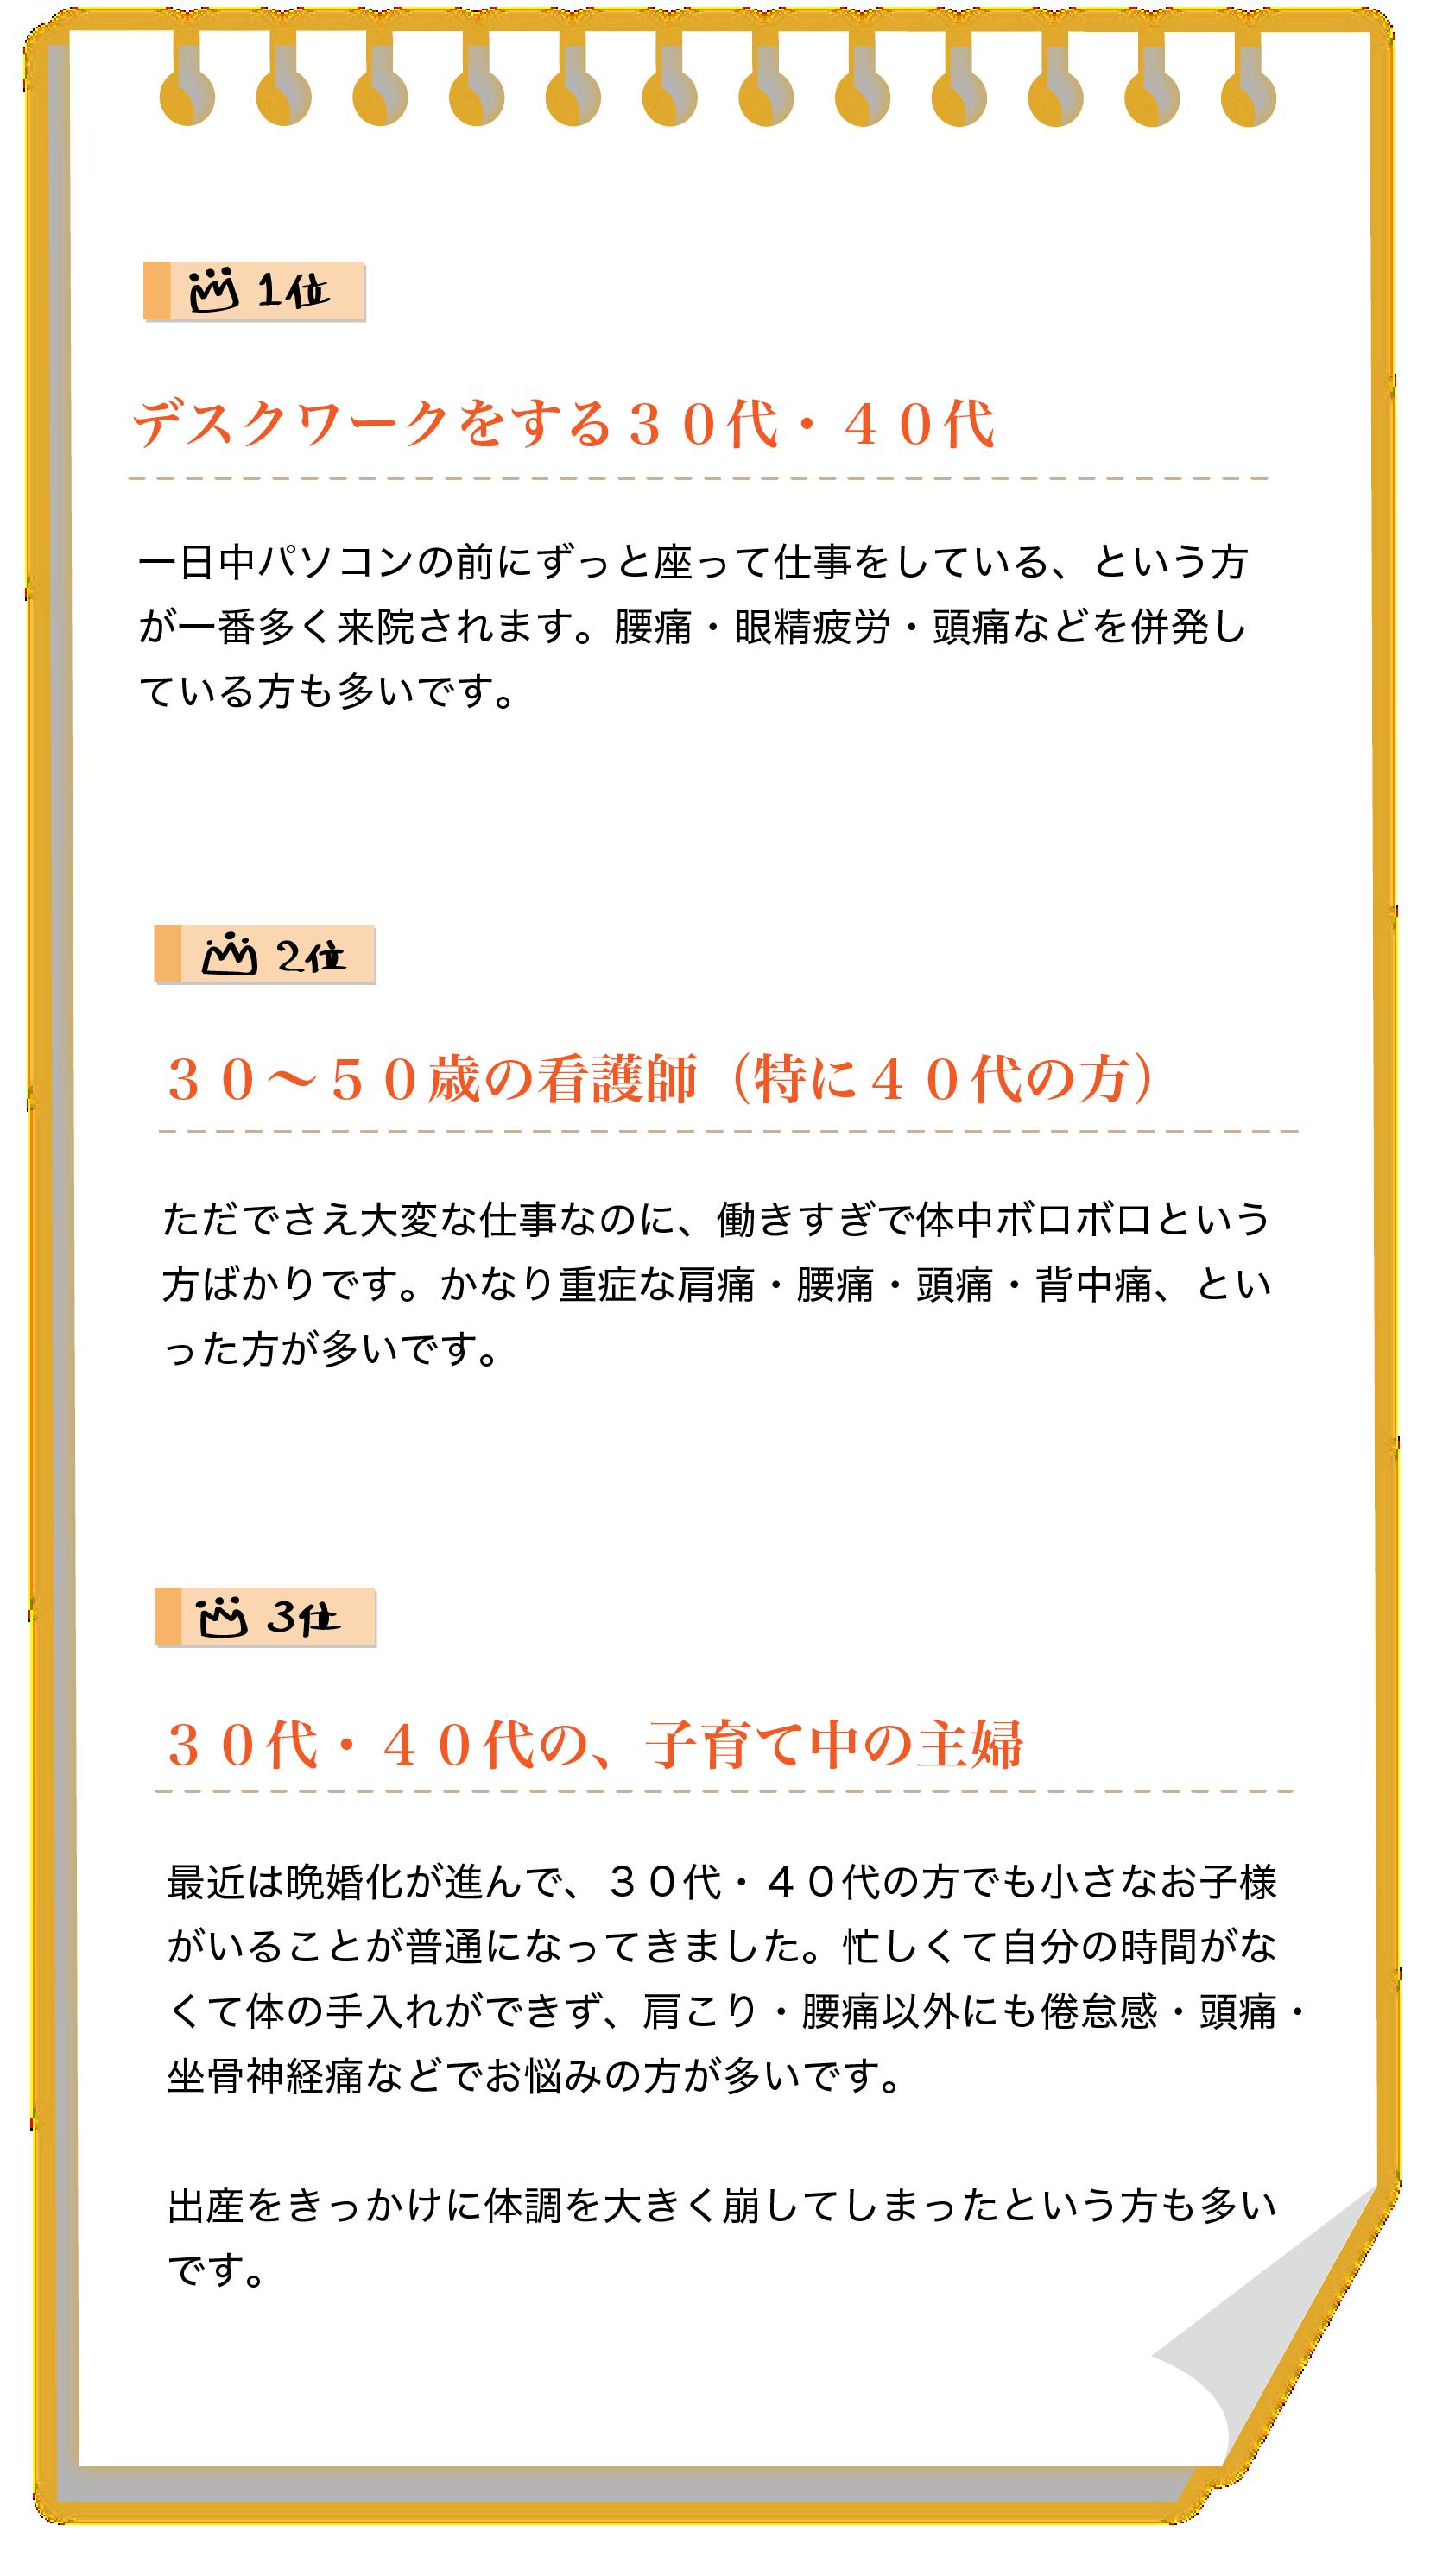 letter 23 - 当施設紹介